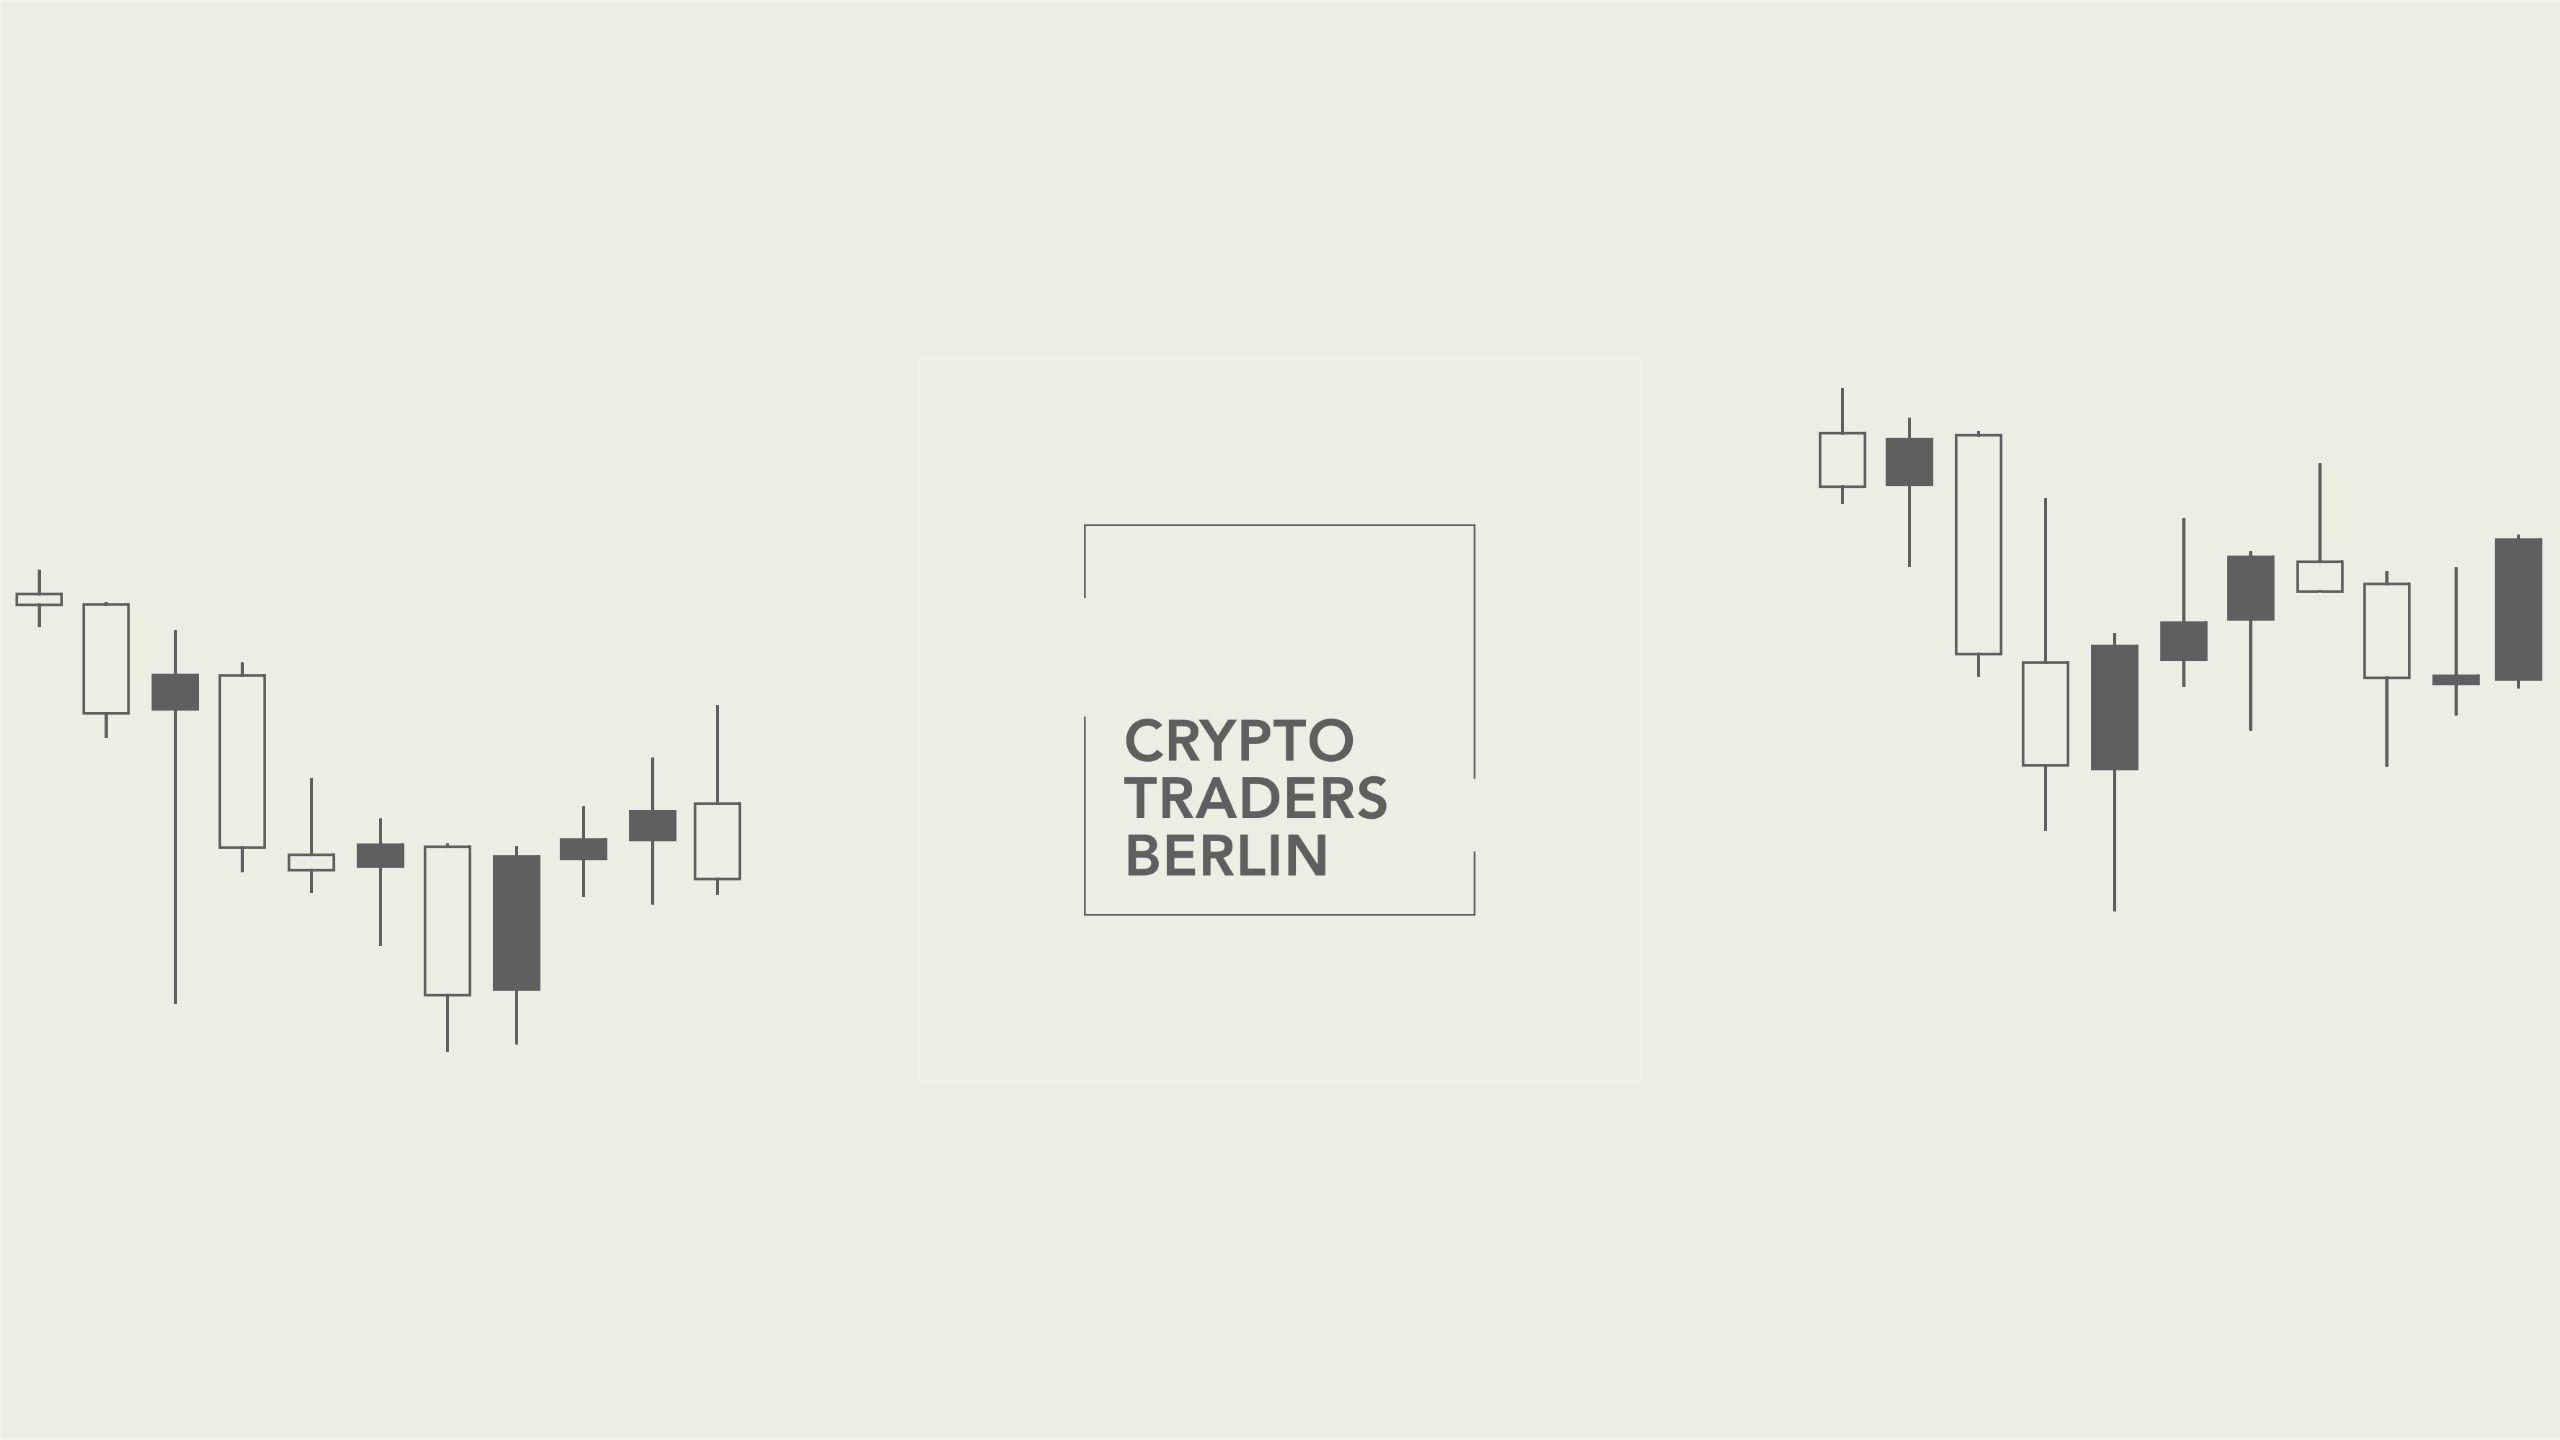 Crypto Traders Berlin